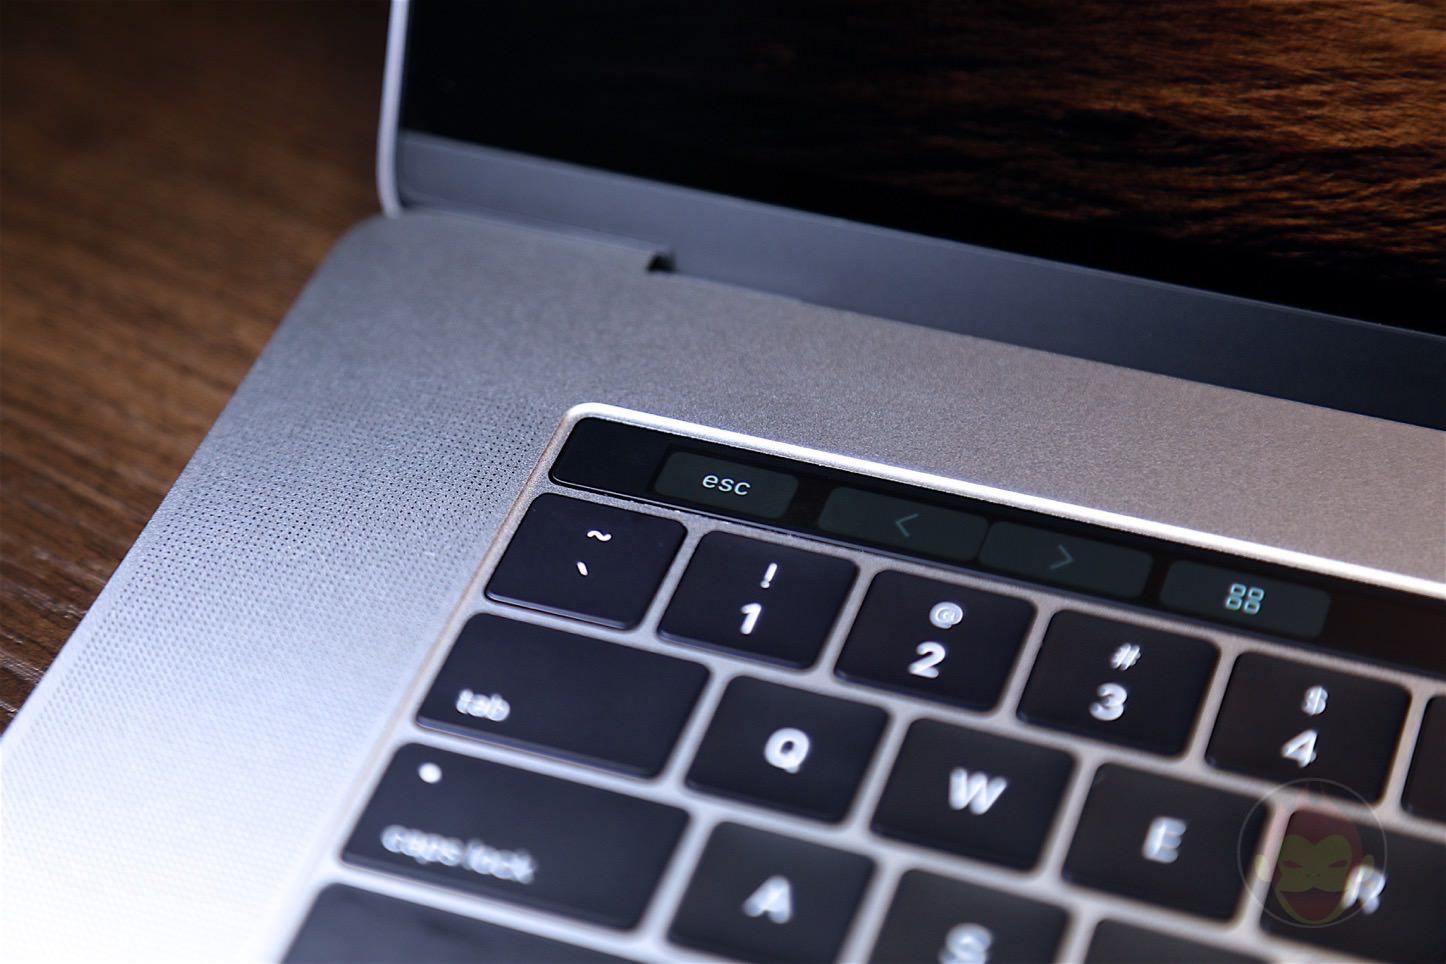 MacBook-Pro-Late-2016-15inch-model-13.jpg